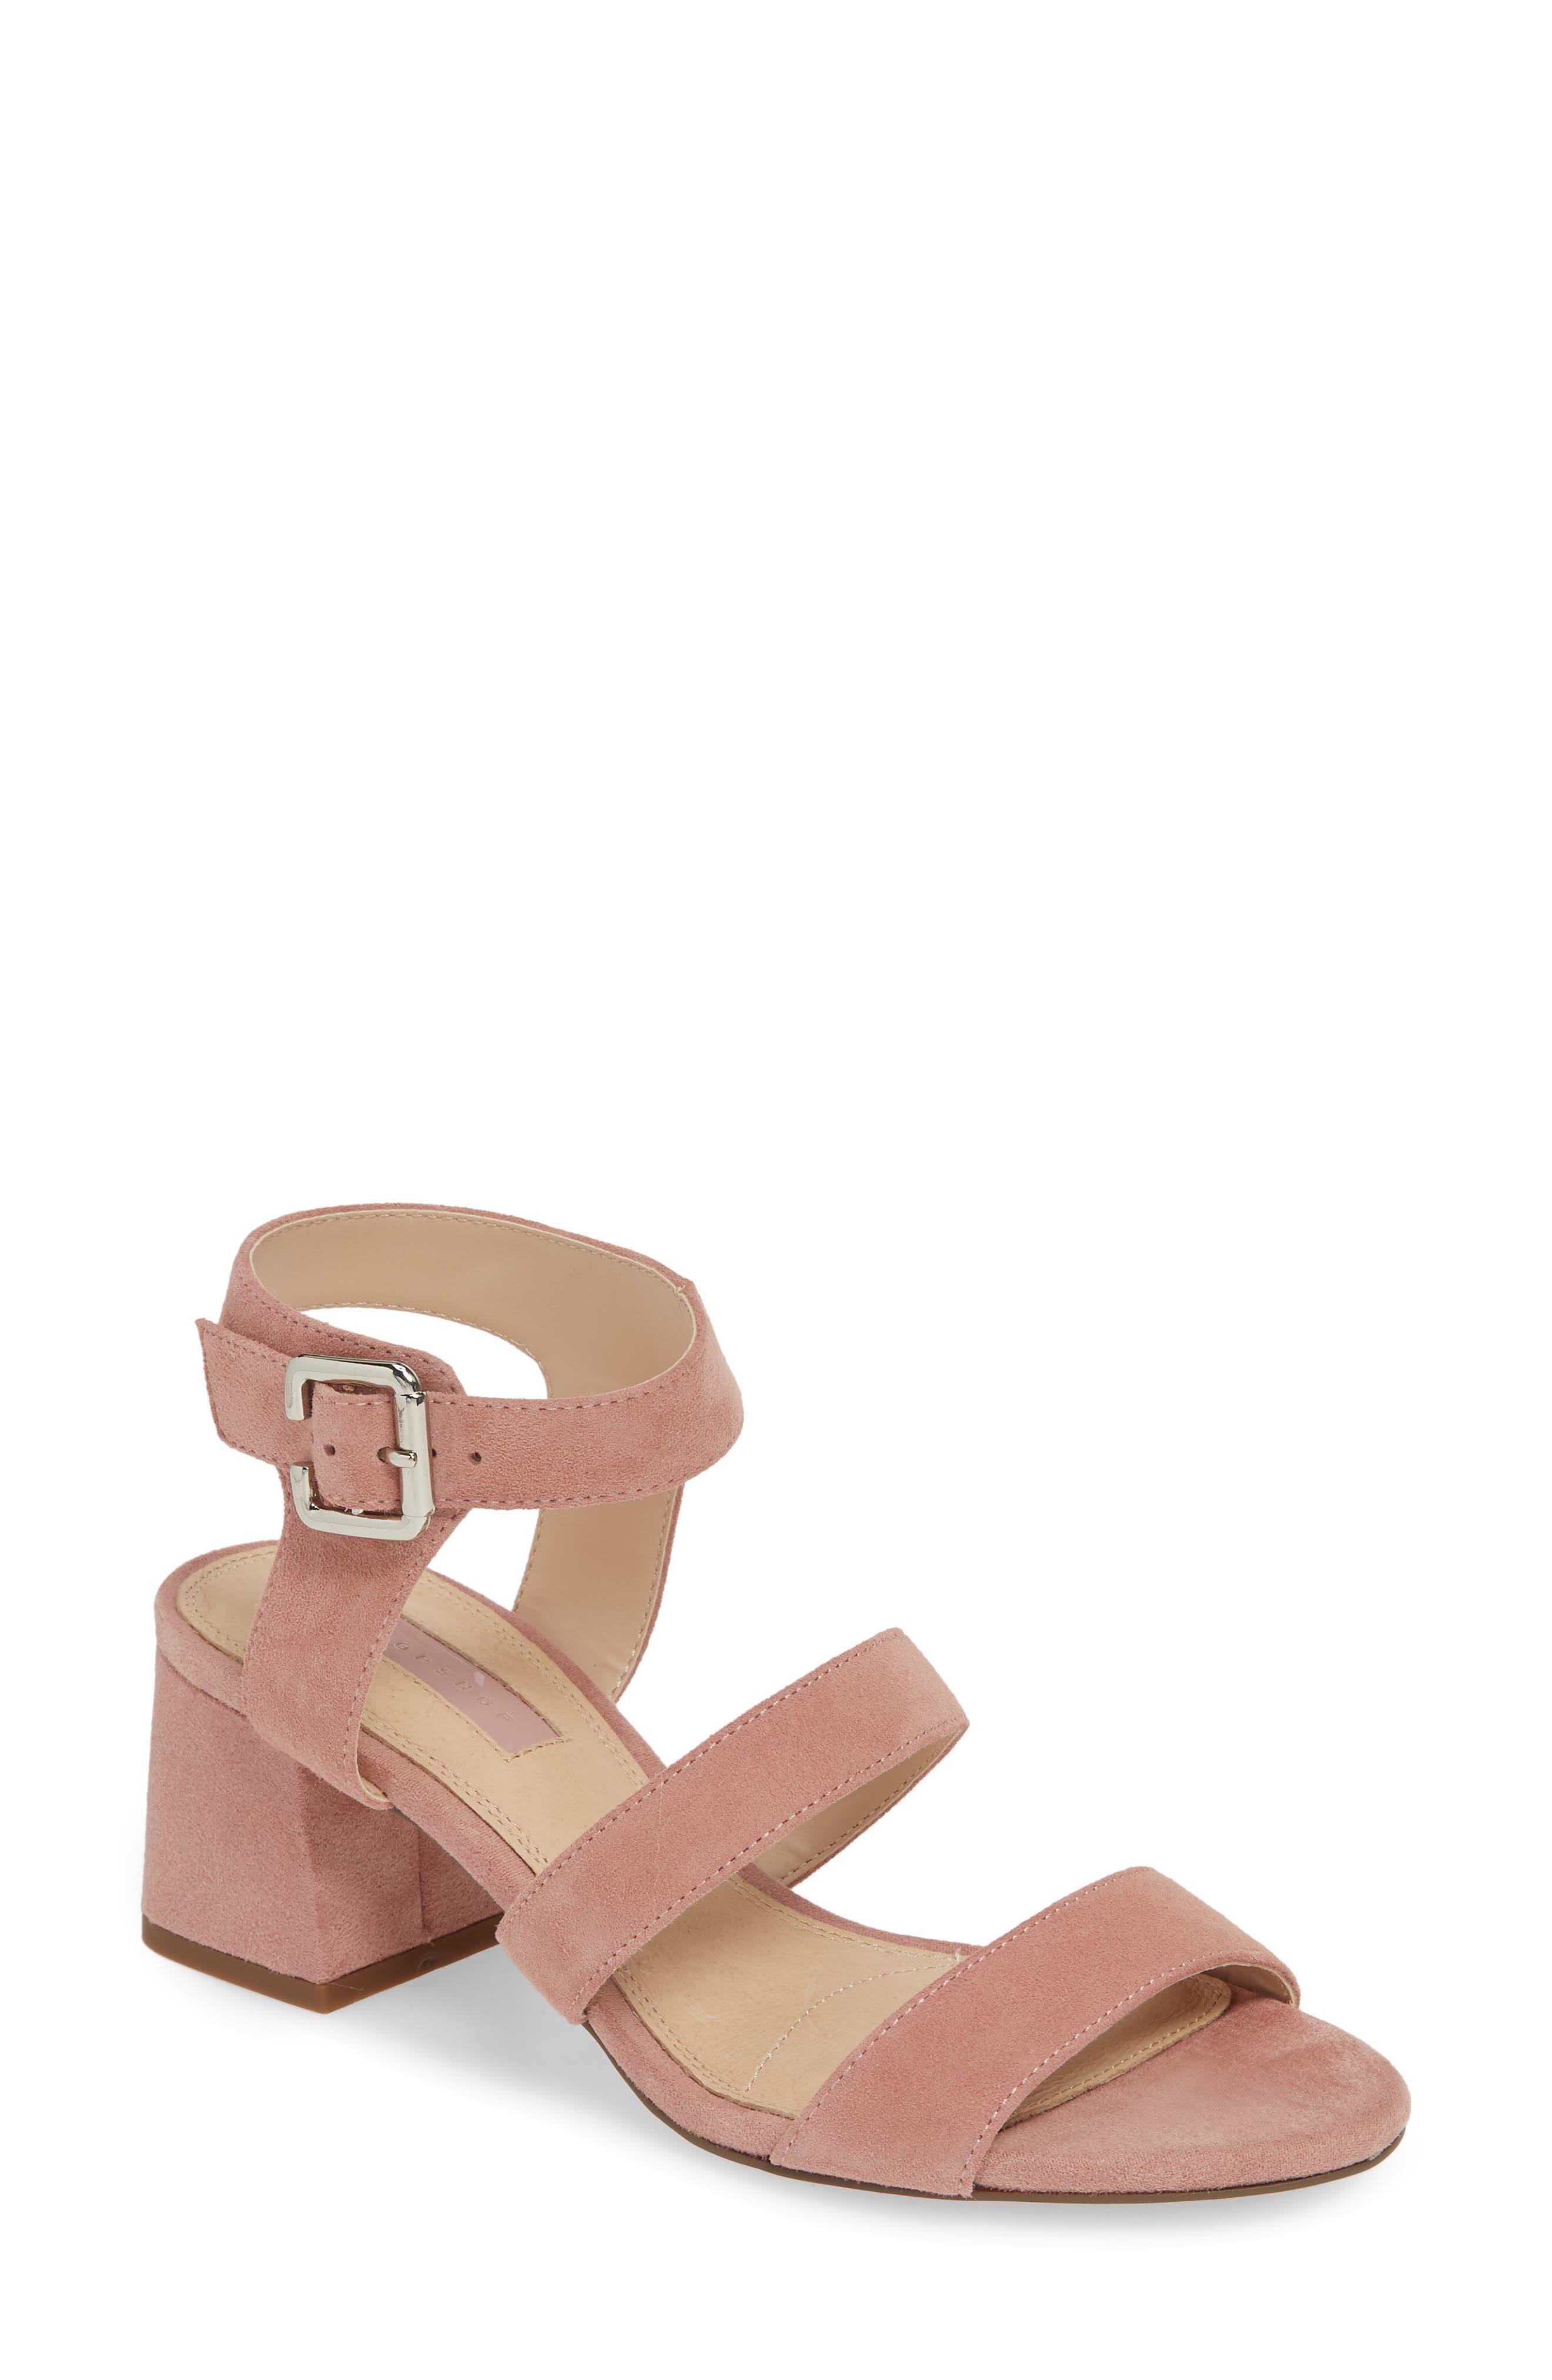 TOPSHOP Nicky Block Heel Sandal, Main, color, NUDE